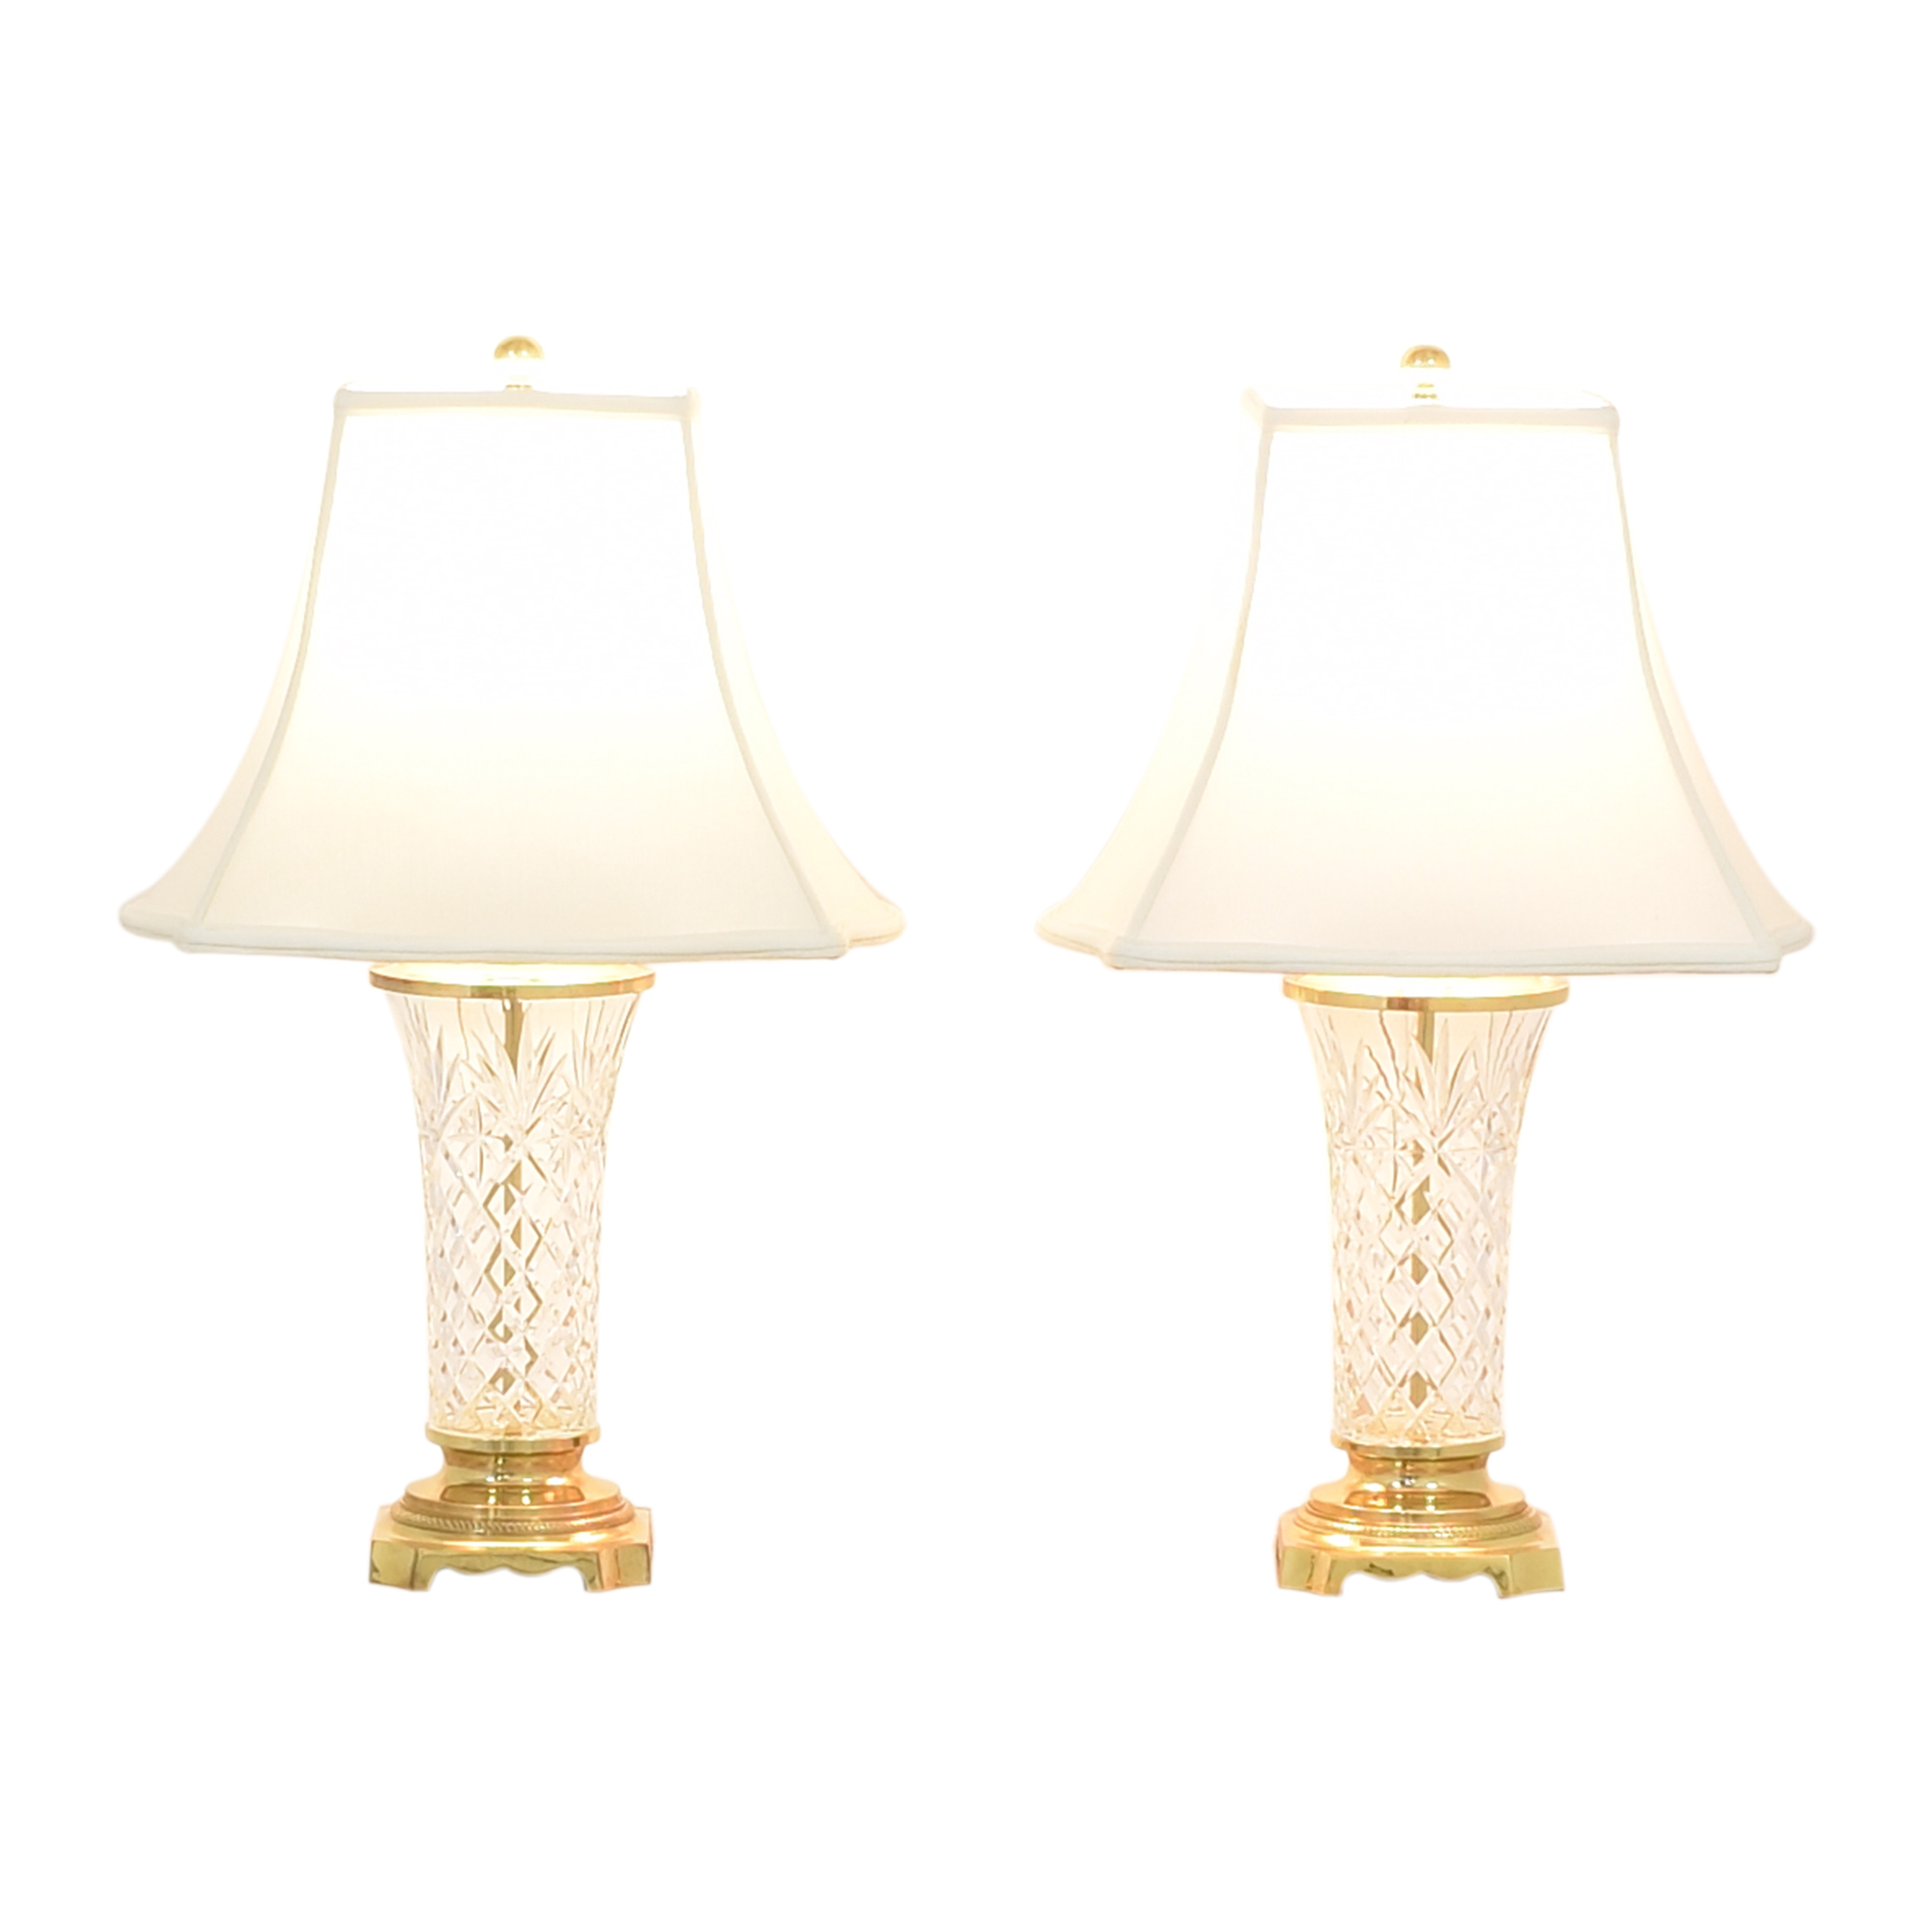 Wildwood Wildwood Table Lamps ct